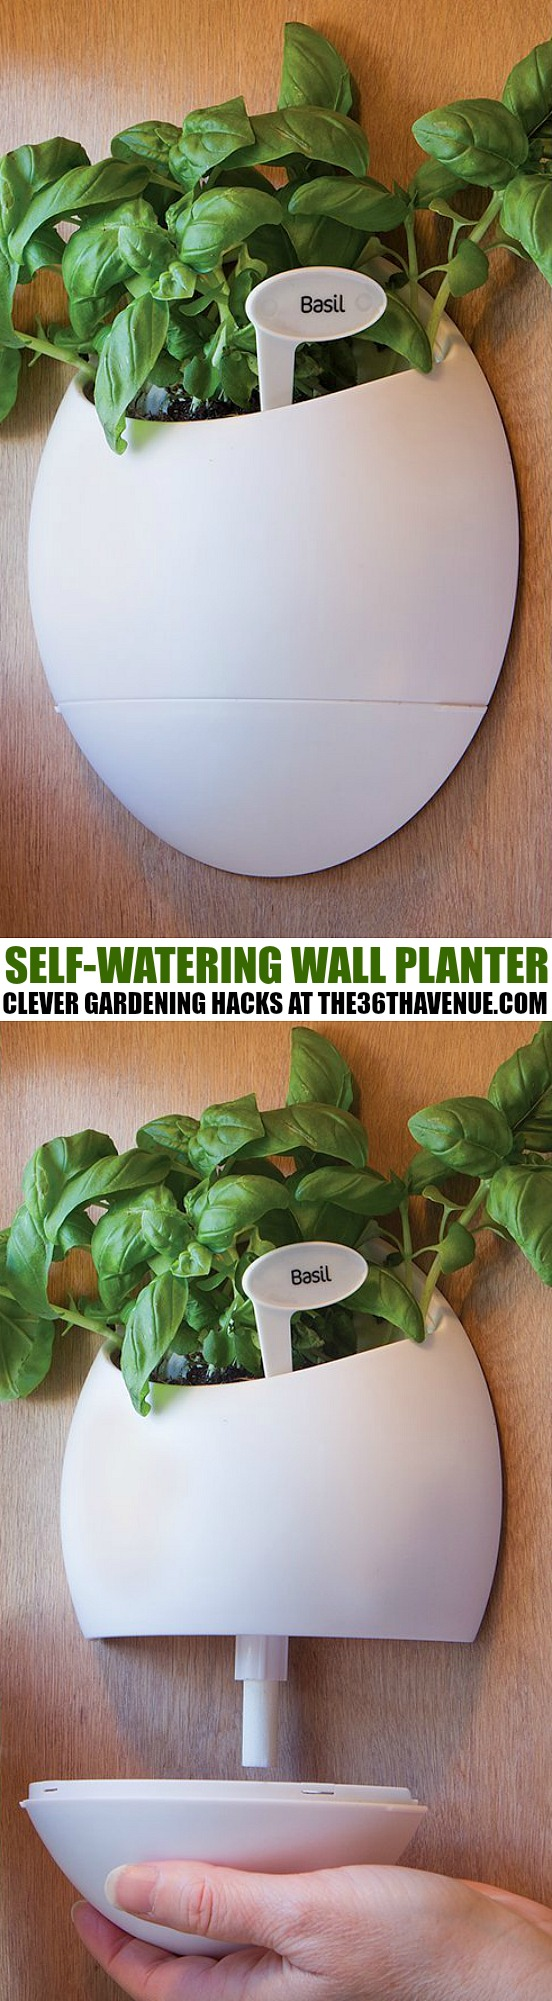 Gardening Hack the36thavenue.com